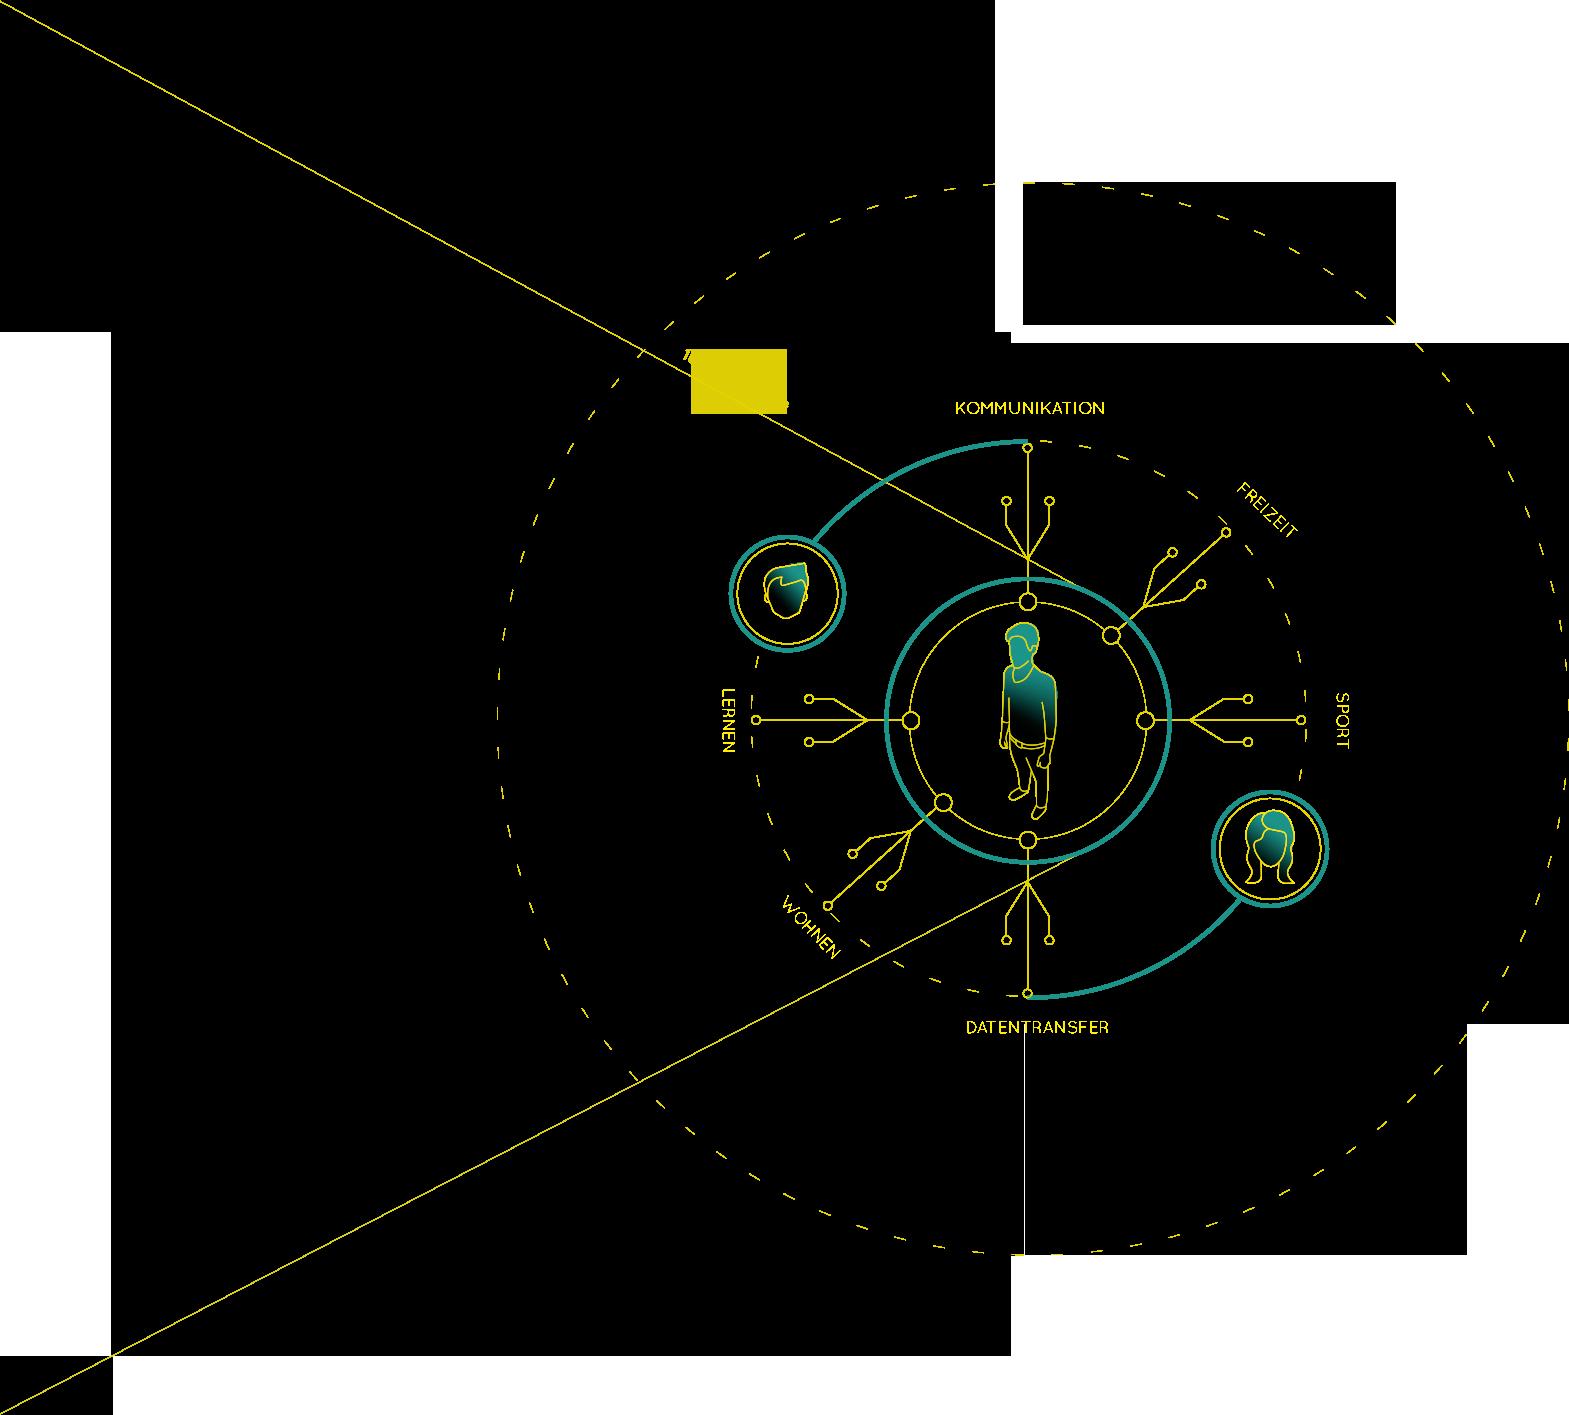 Grafik-Kreis-mit-text